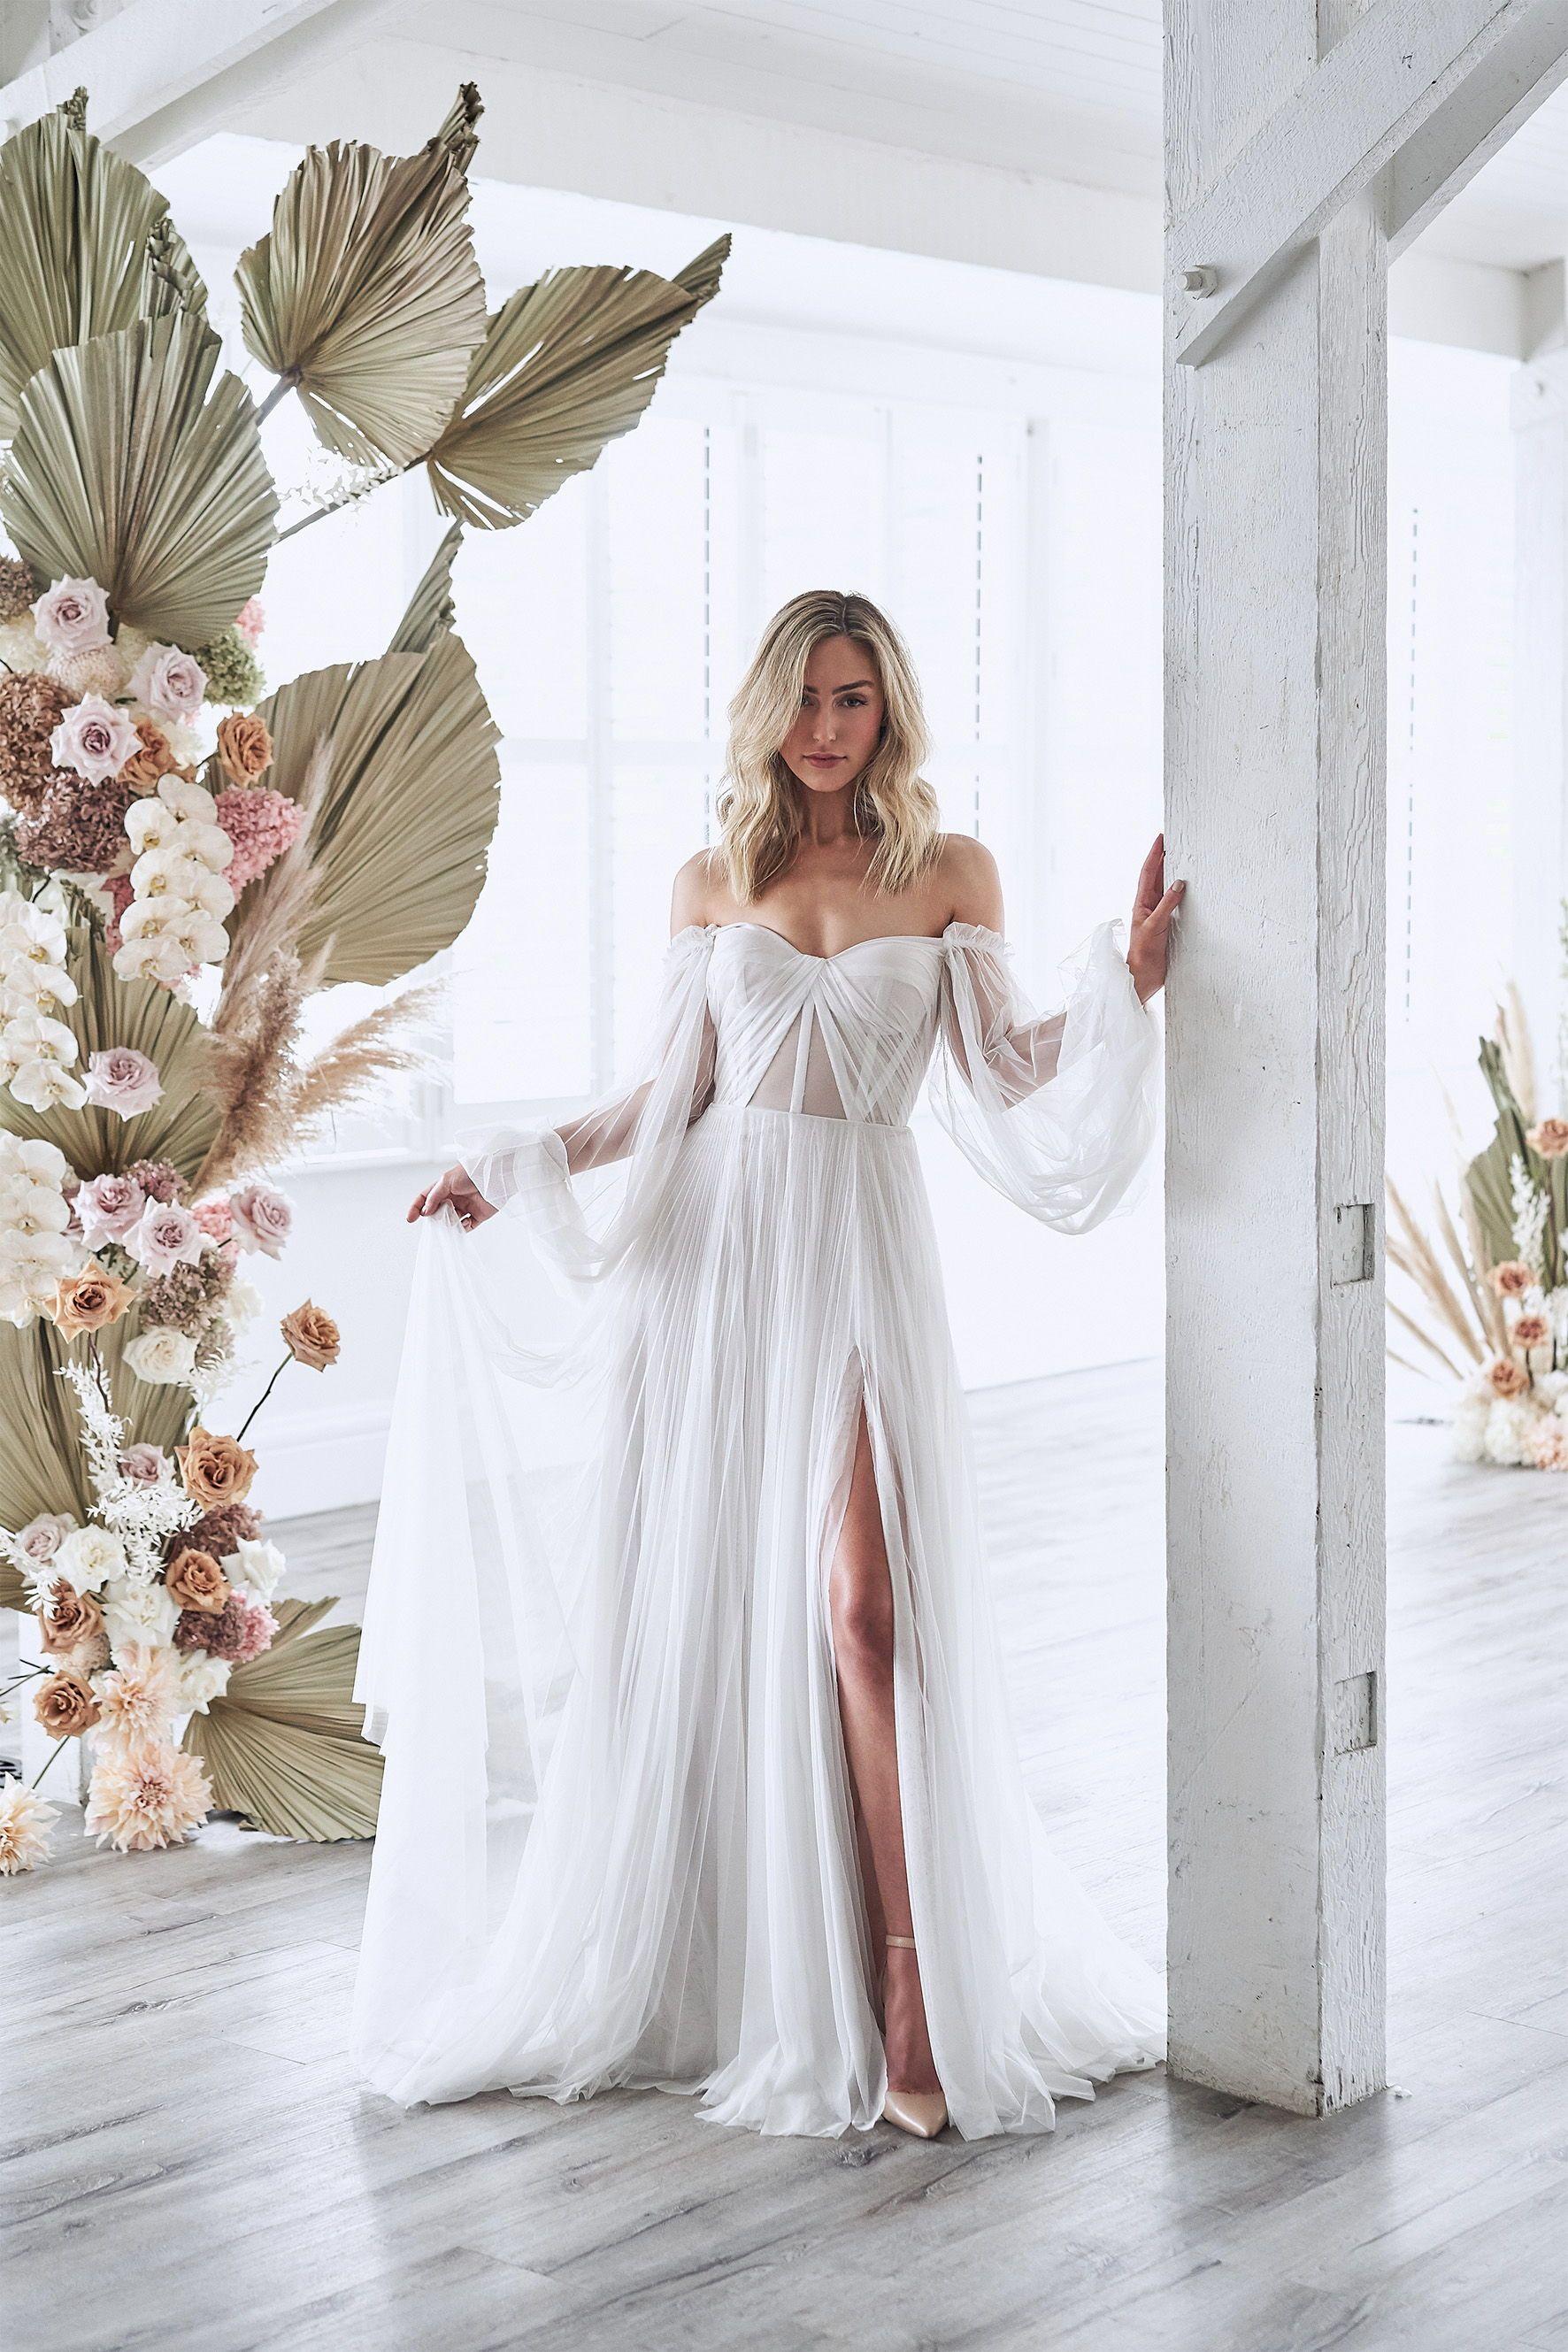 Timeless Elegance In This Romantic Minimalist Wedding Wedding Dress Inspiration Wedding Dresses Minimalist Wedding Dresses [ 2658 x 1772 Pixel ]